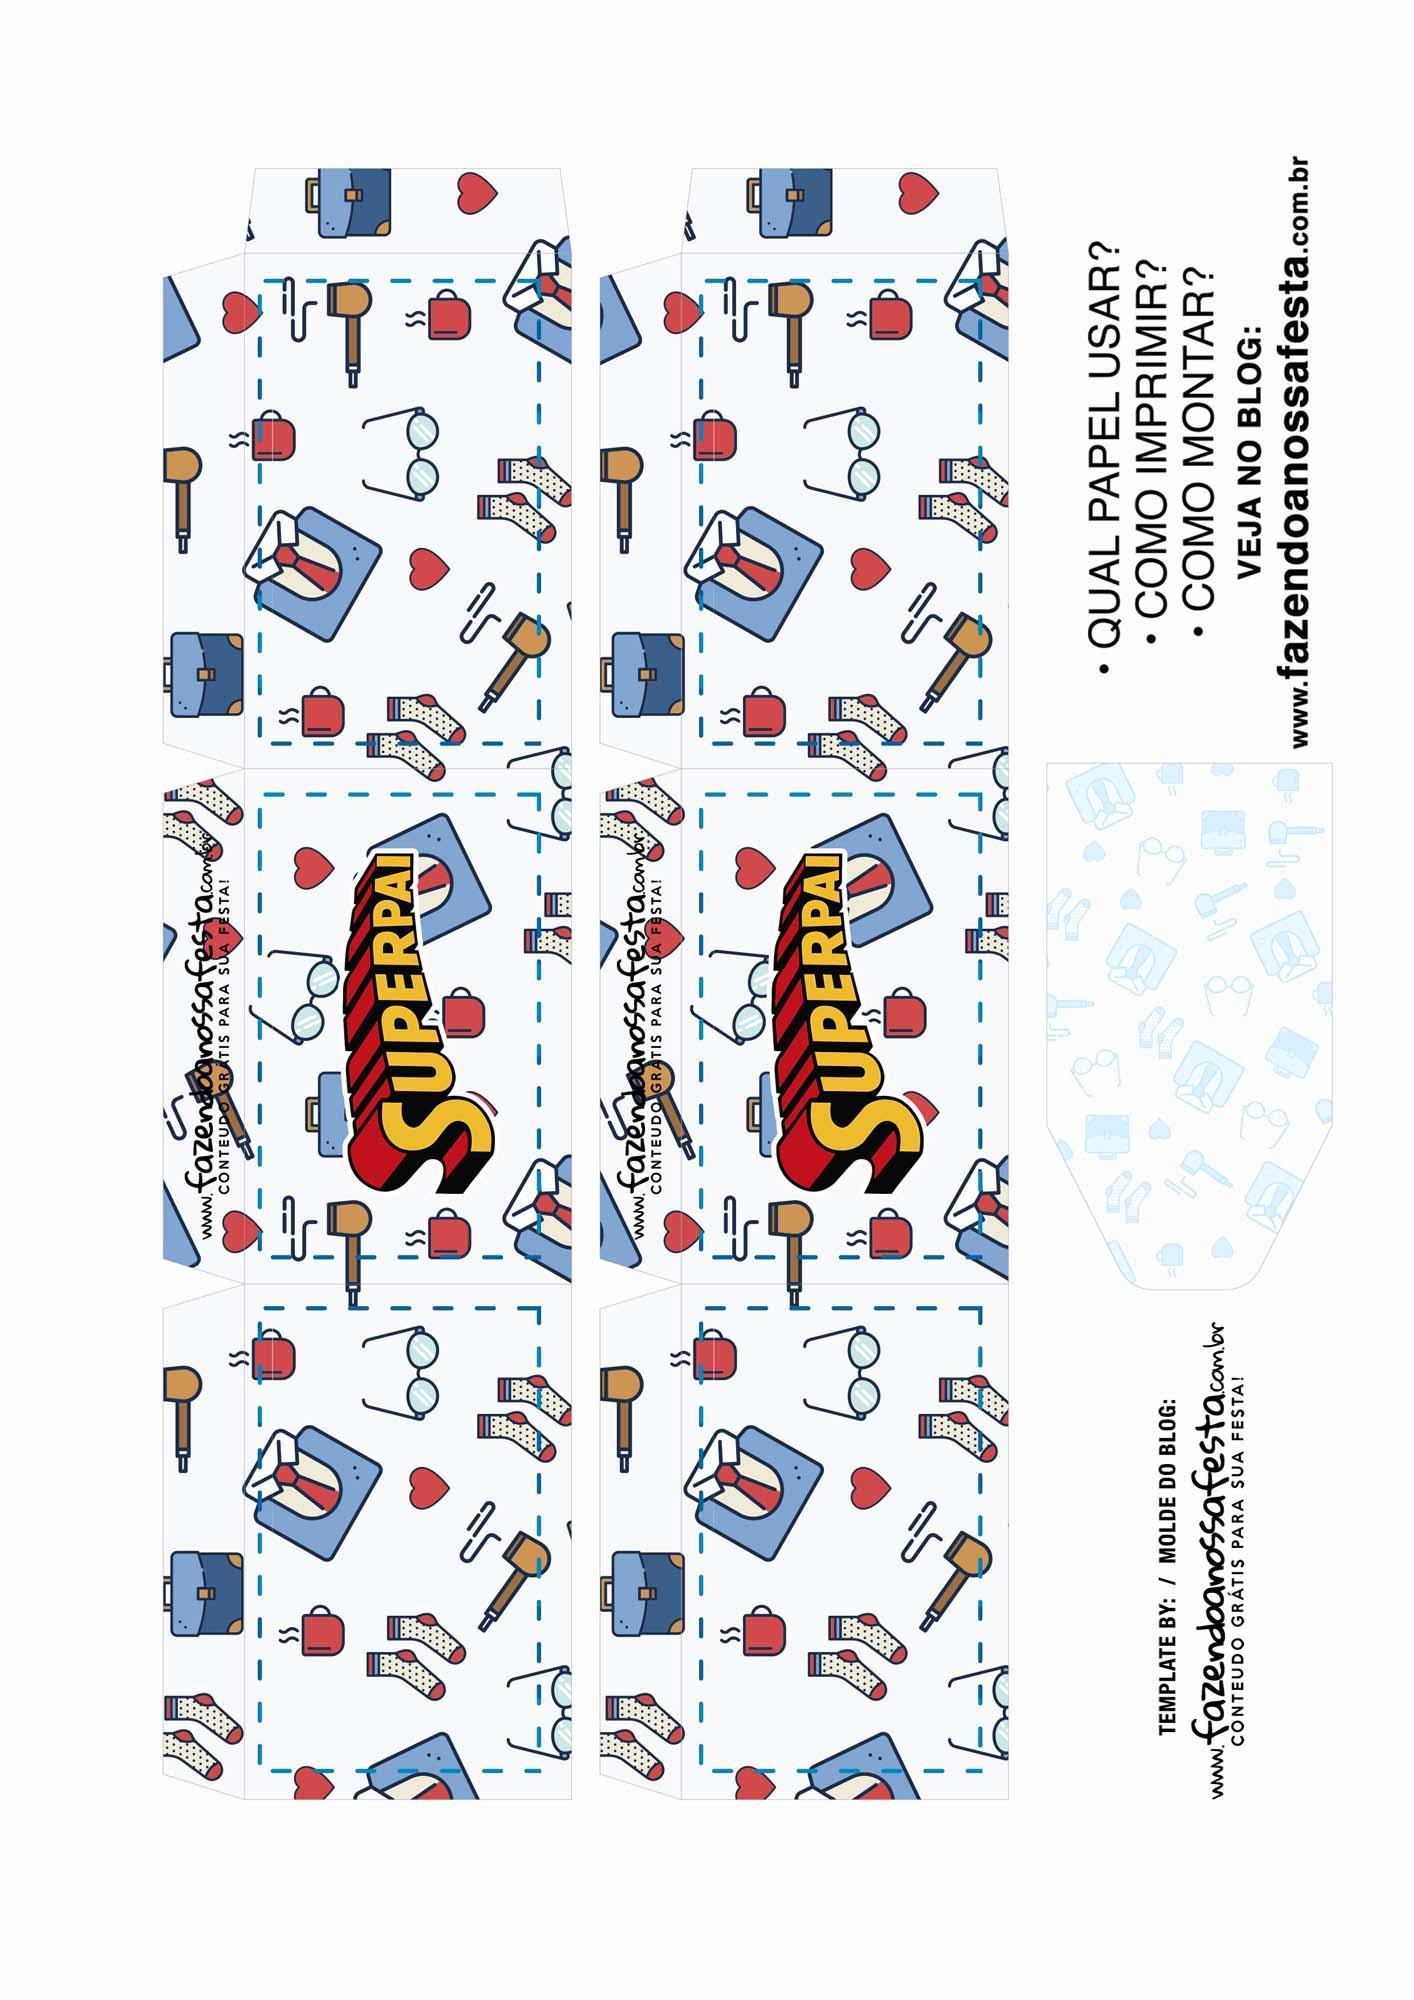 Caixa Explosiva Dia dos Pais Gravata 2